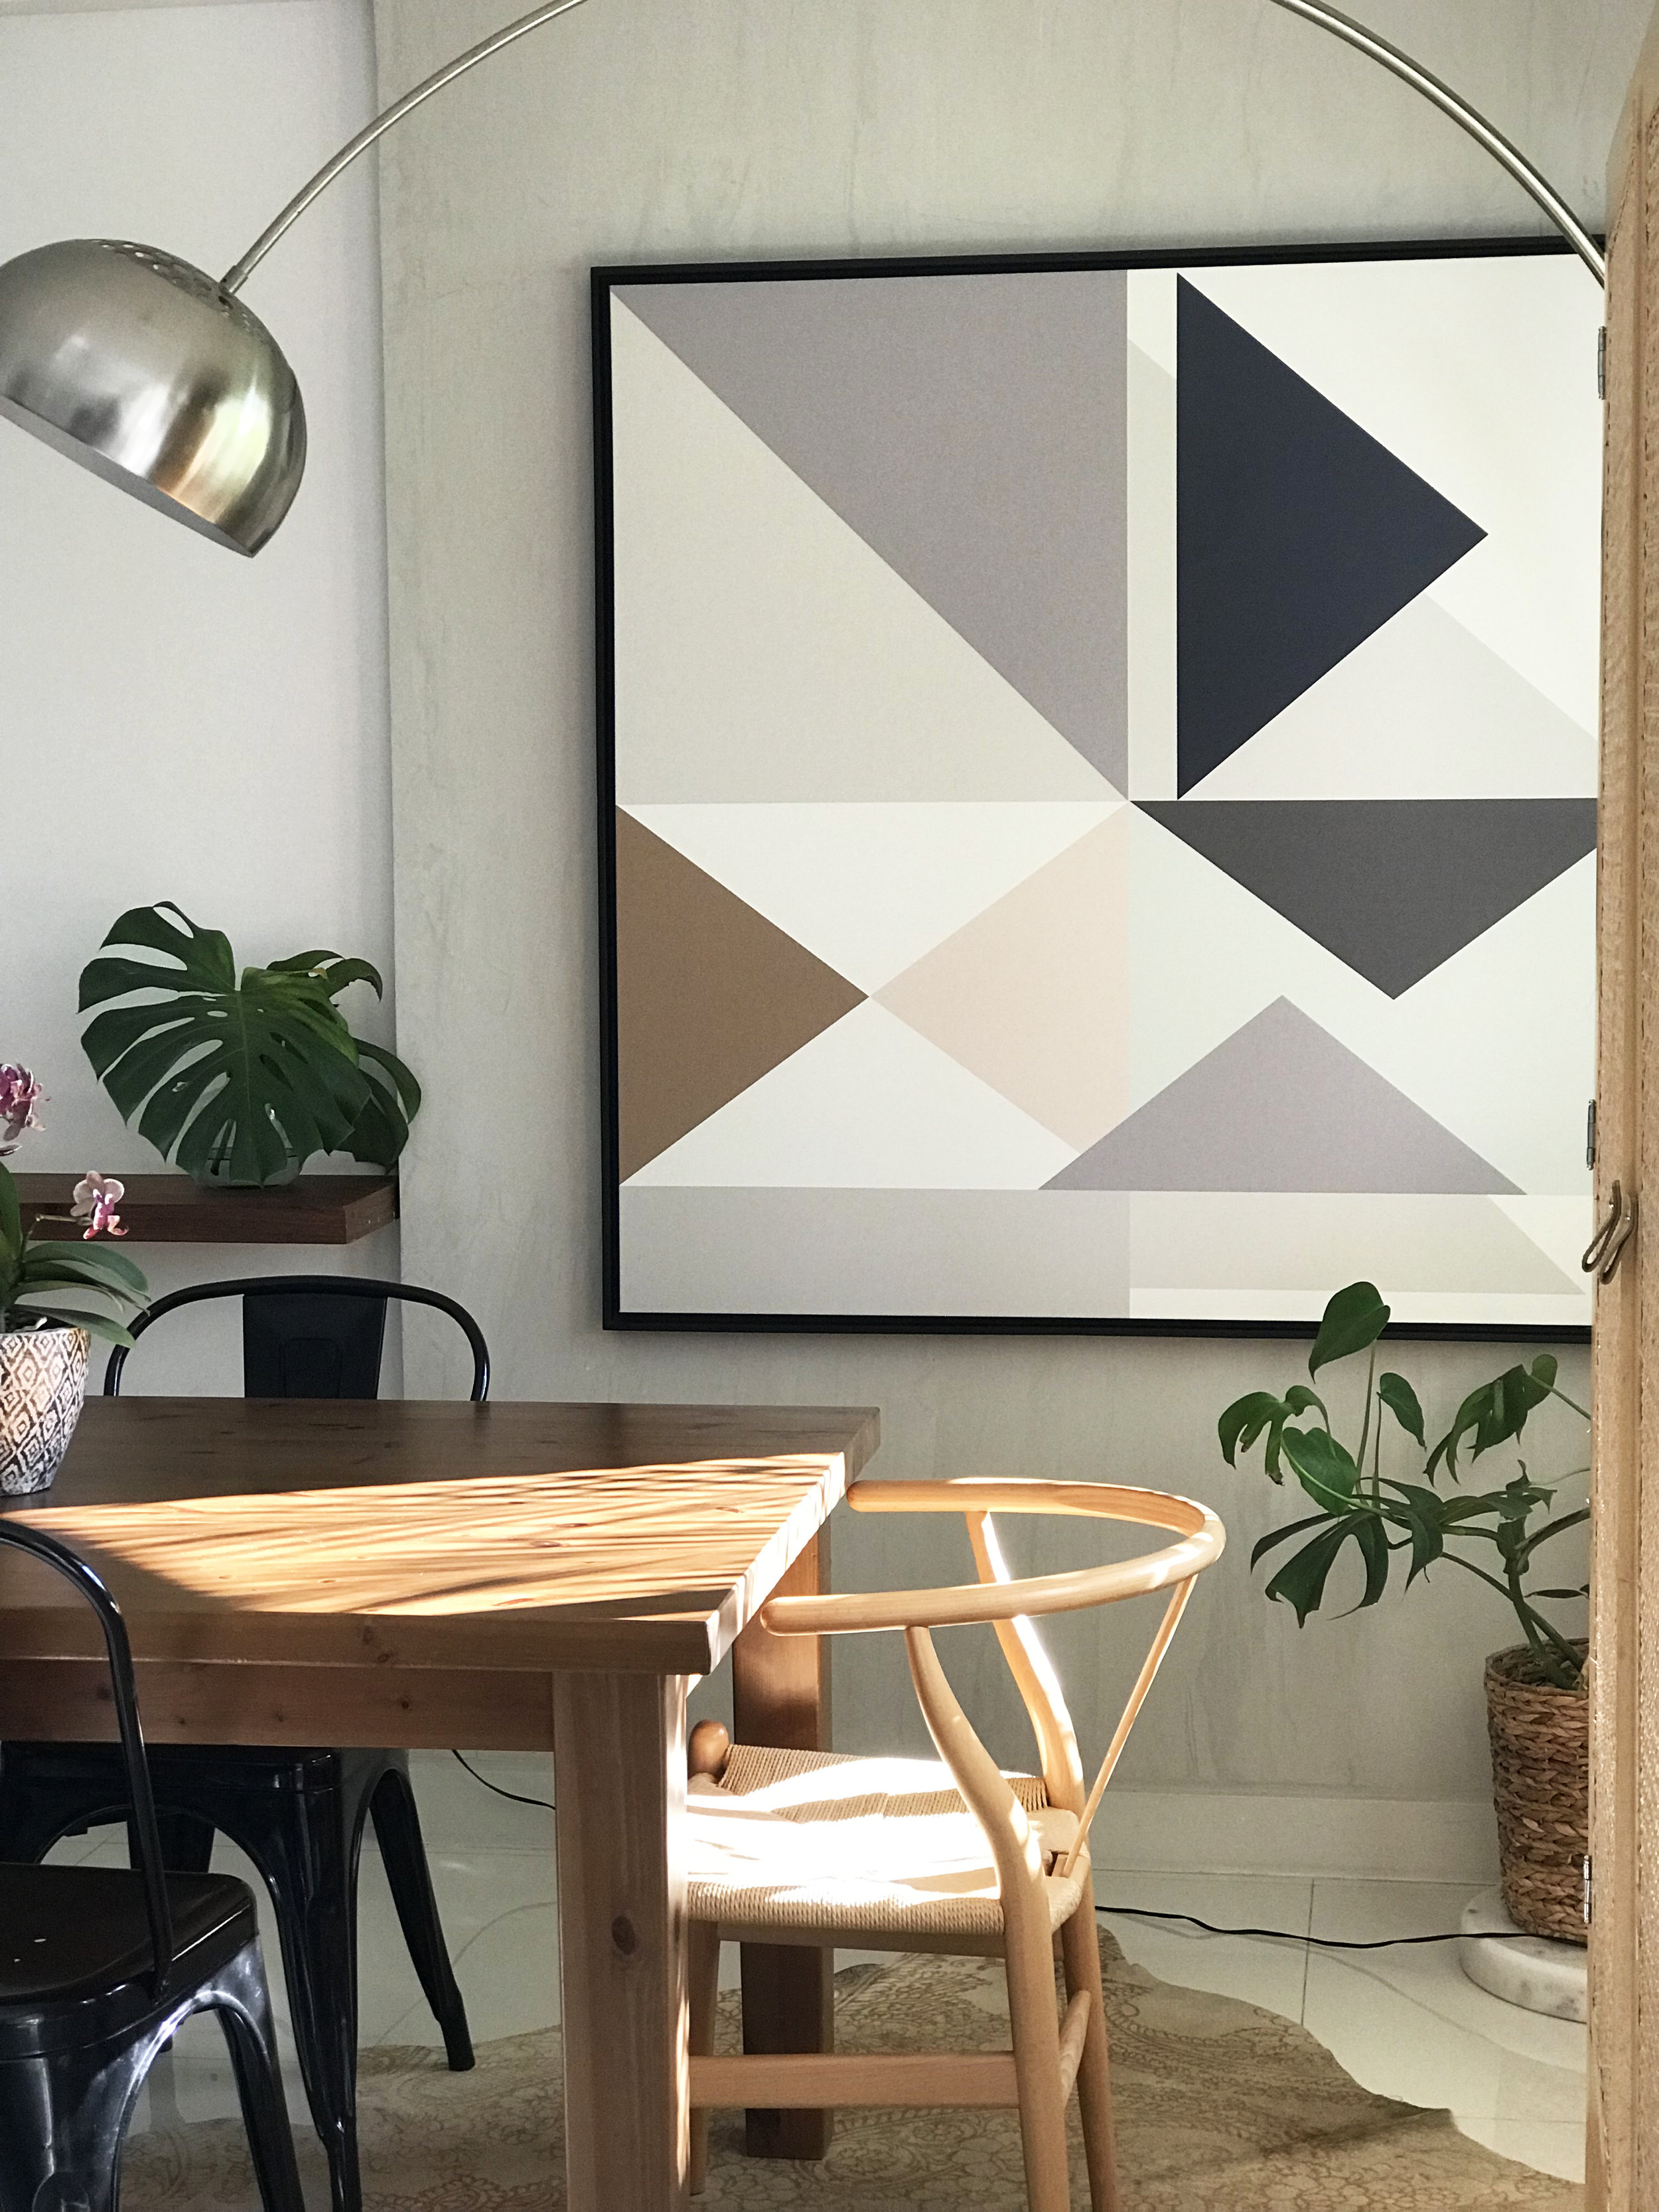 Arrows - paleta pastel 1,30 x 1,30m  PROJETO nara maitre